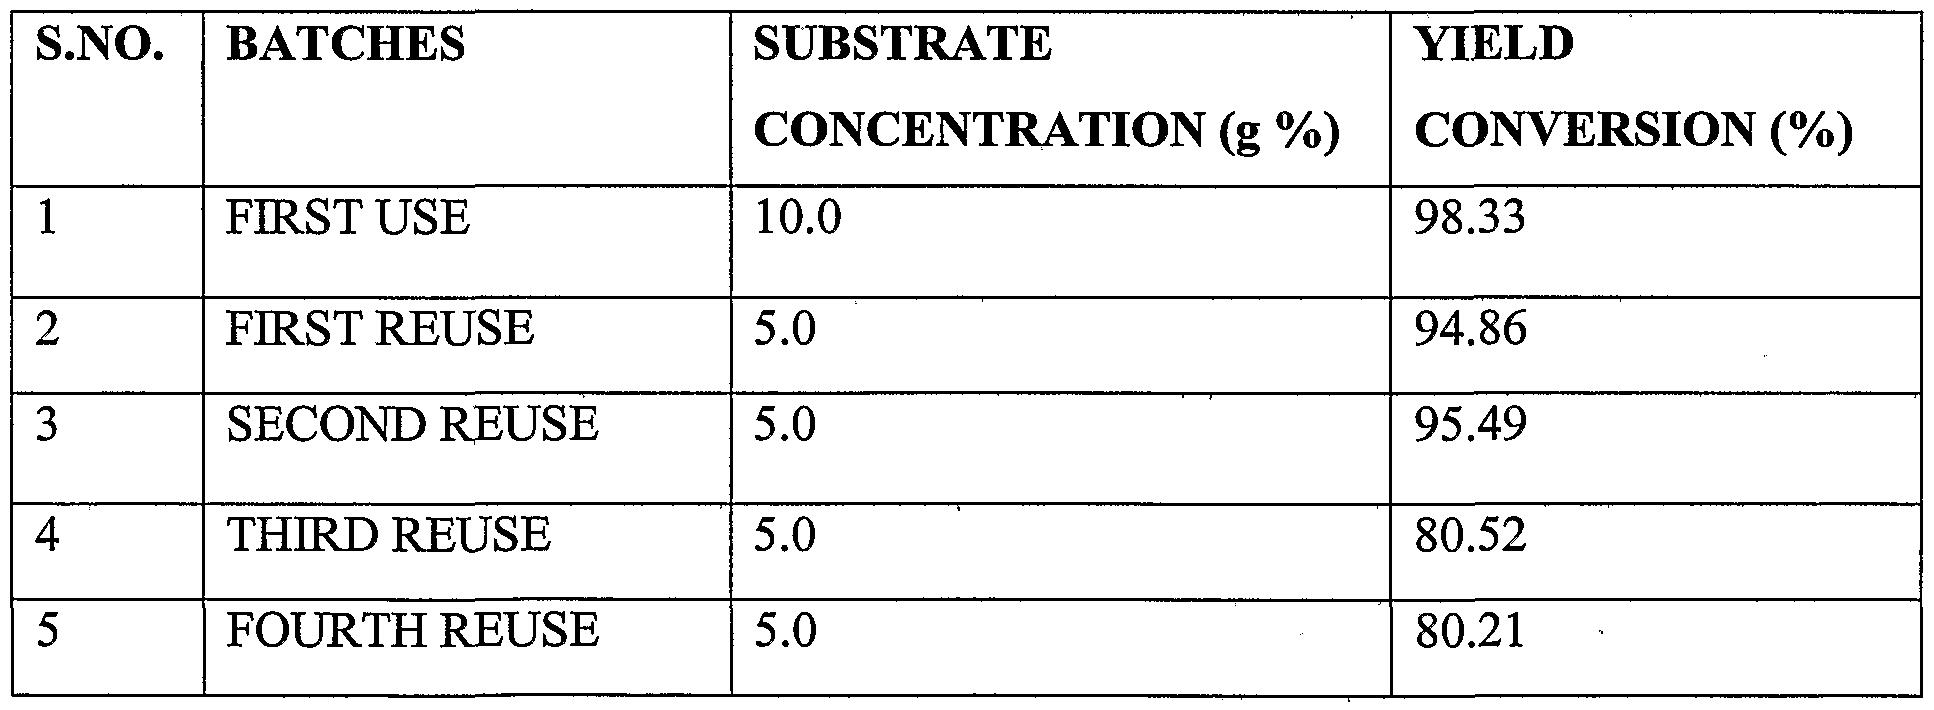 WO2005106006A2 - Biotransformation of nicotinic acid to 6